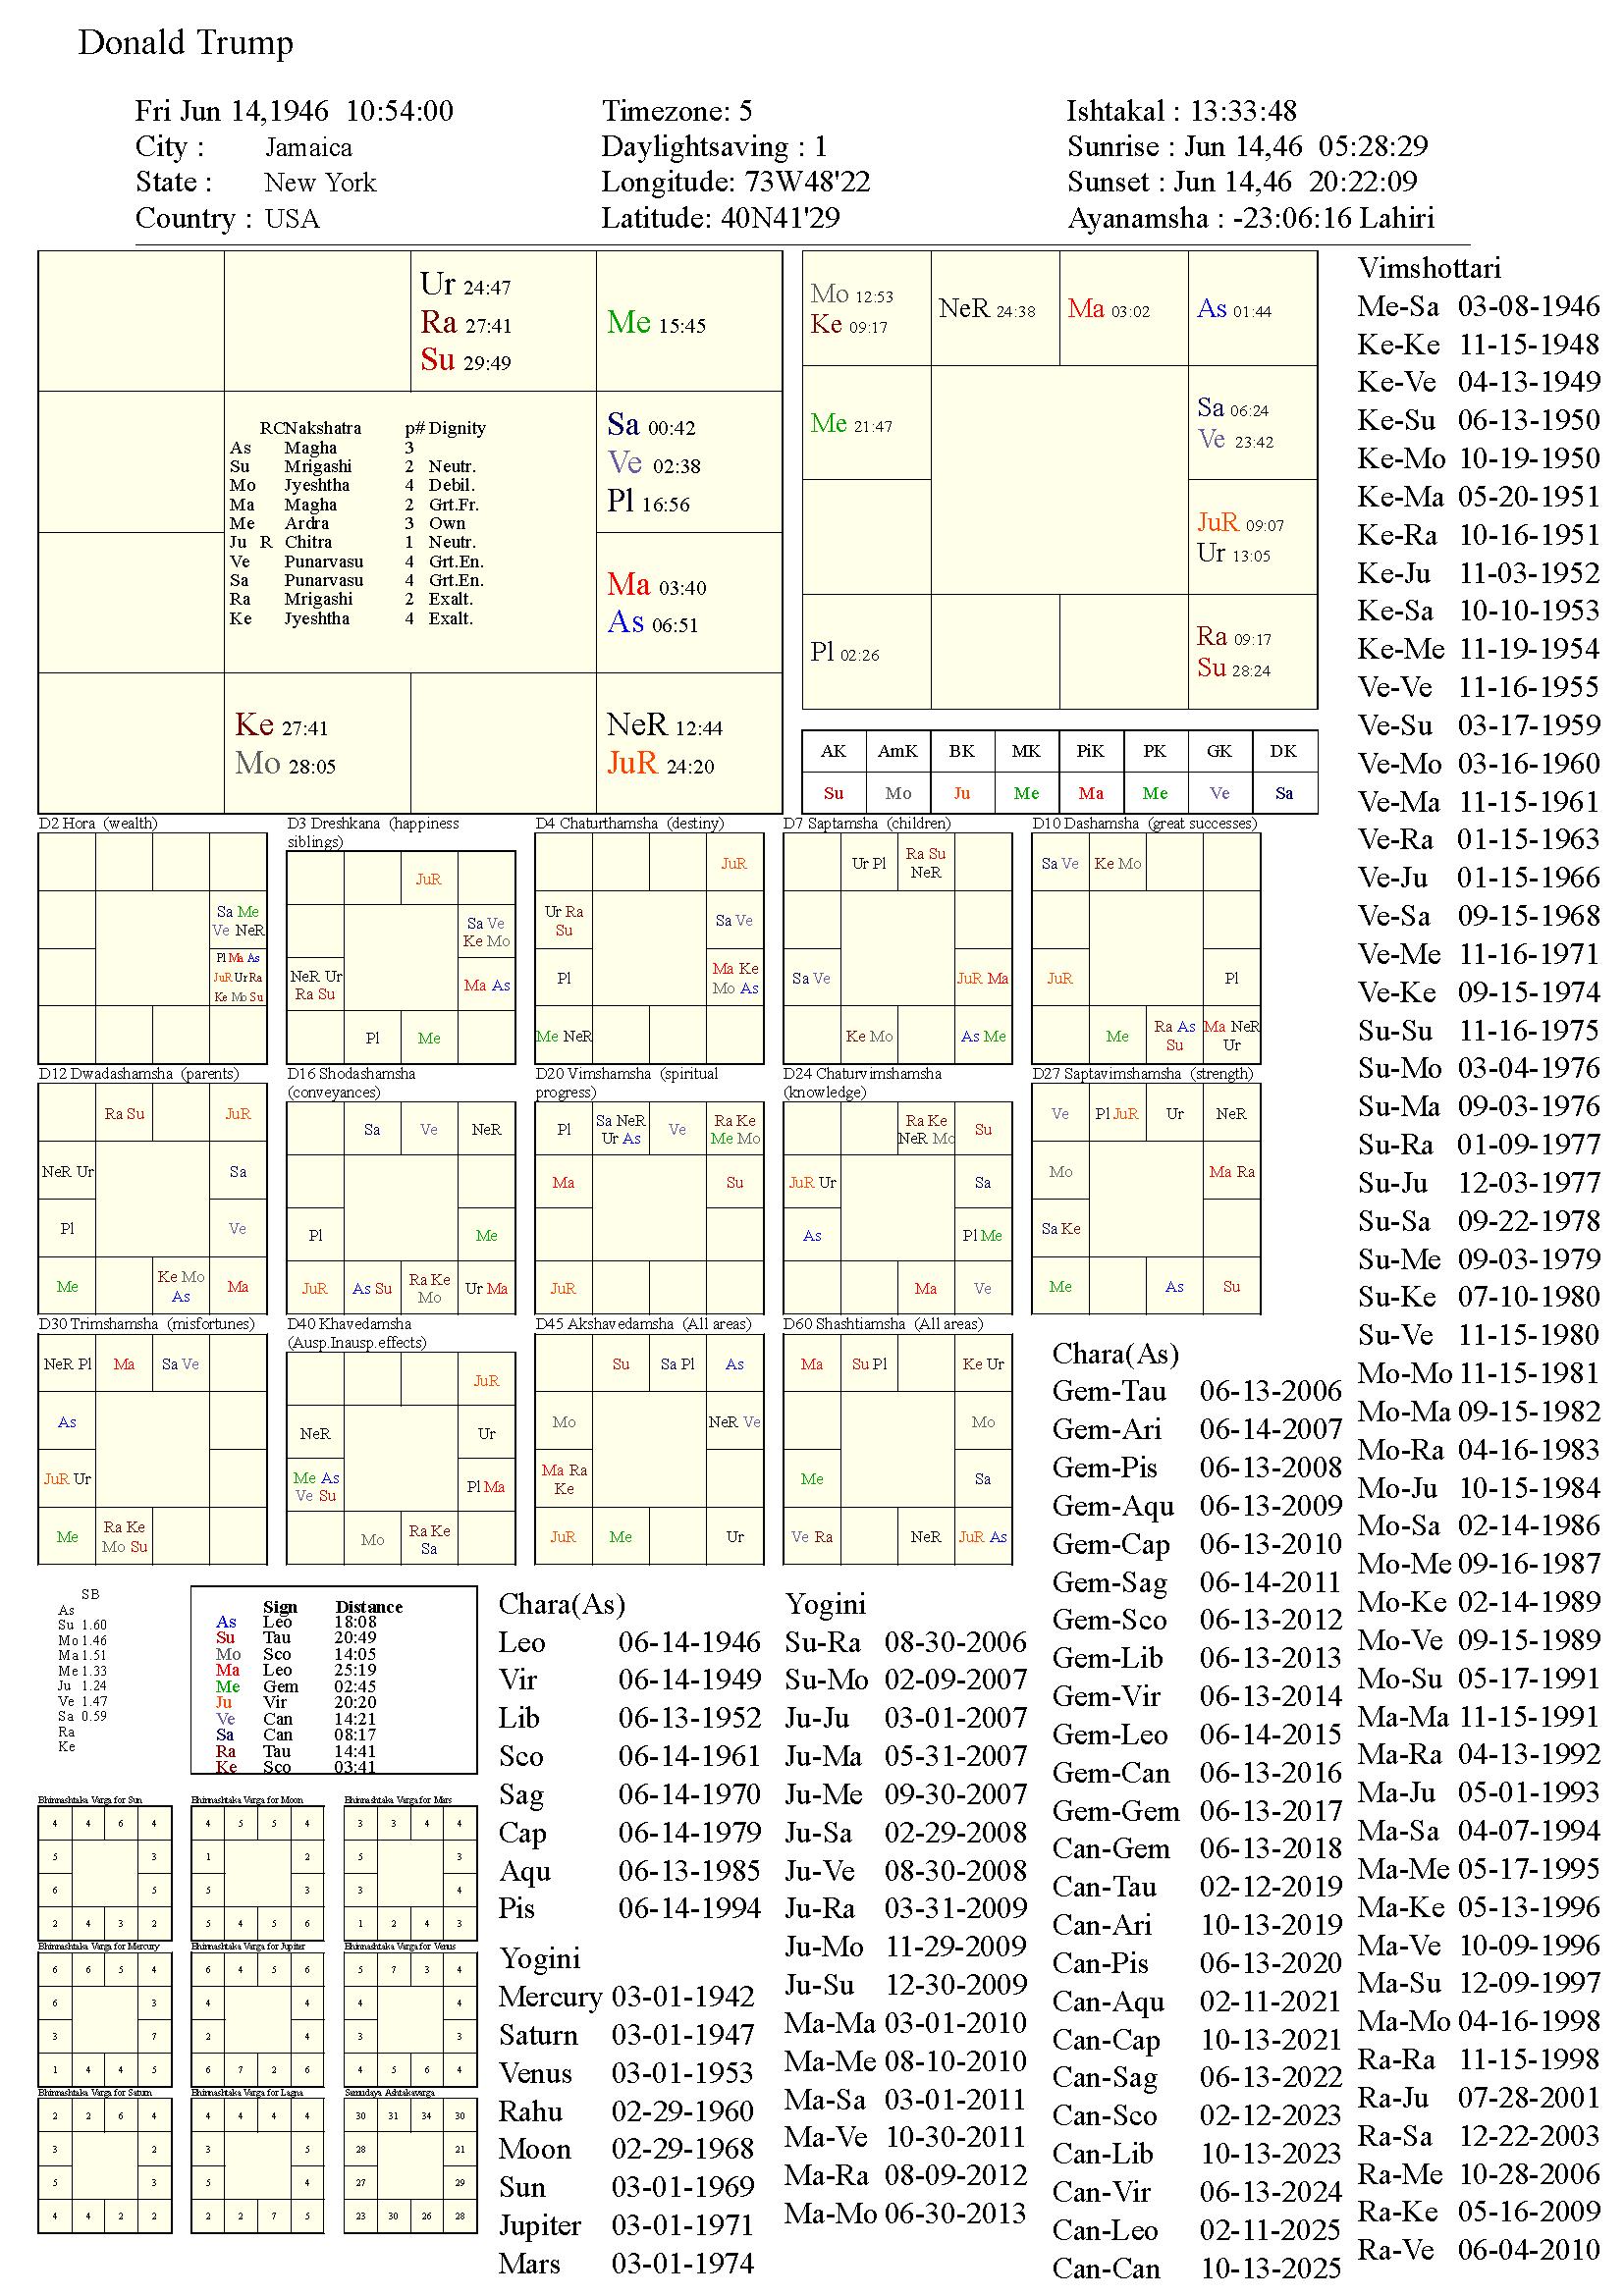 donaldtrump_chart